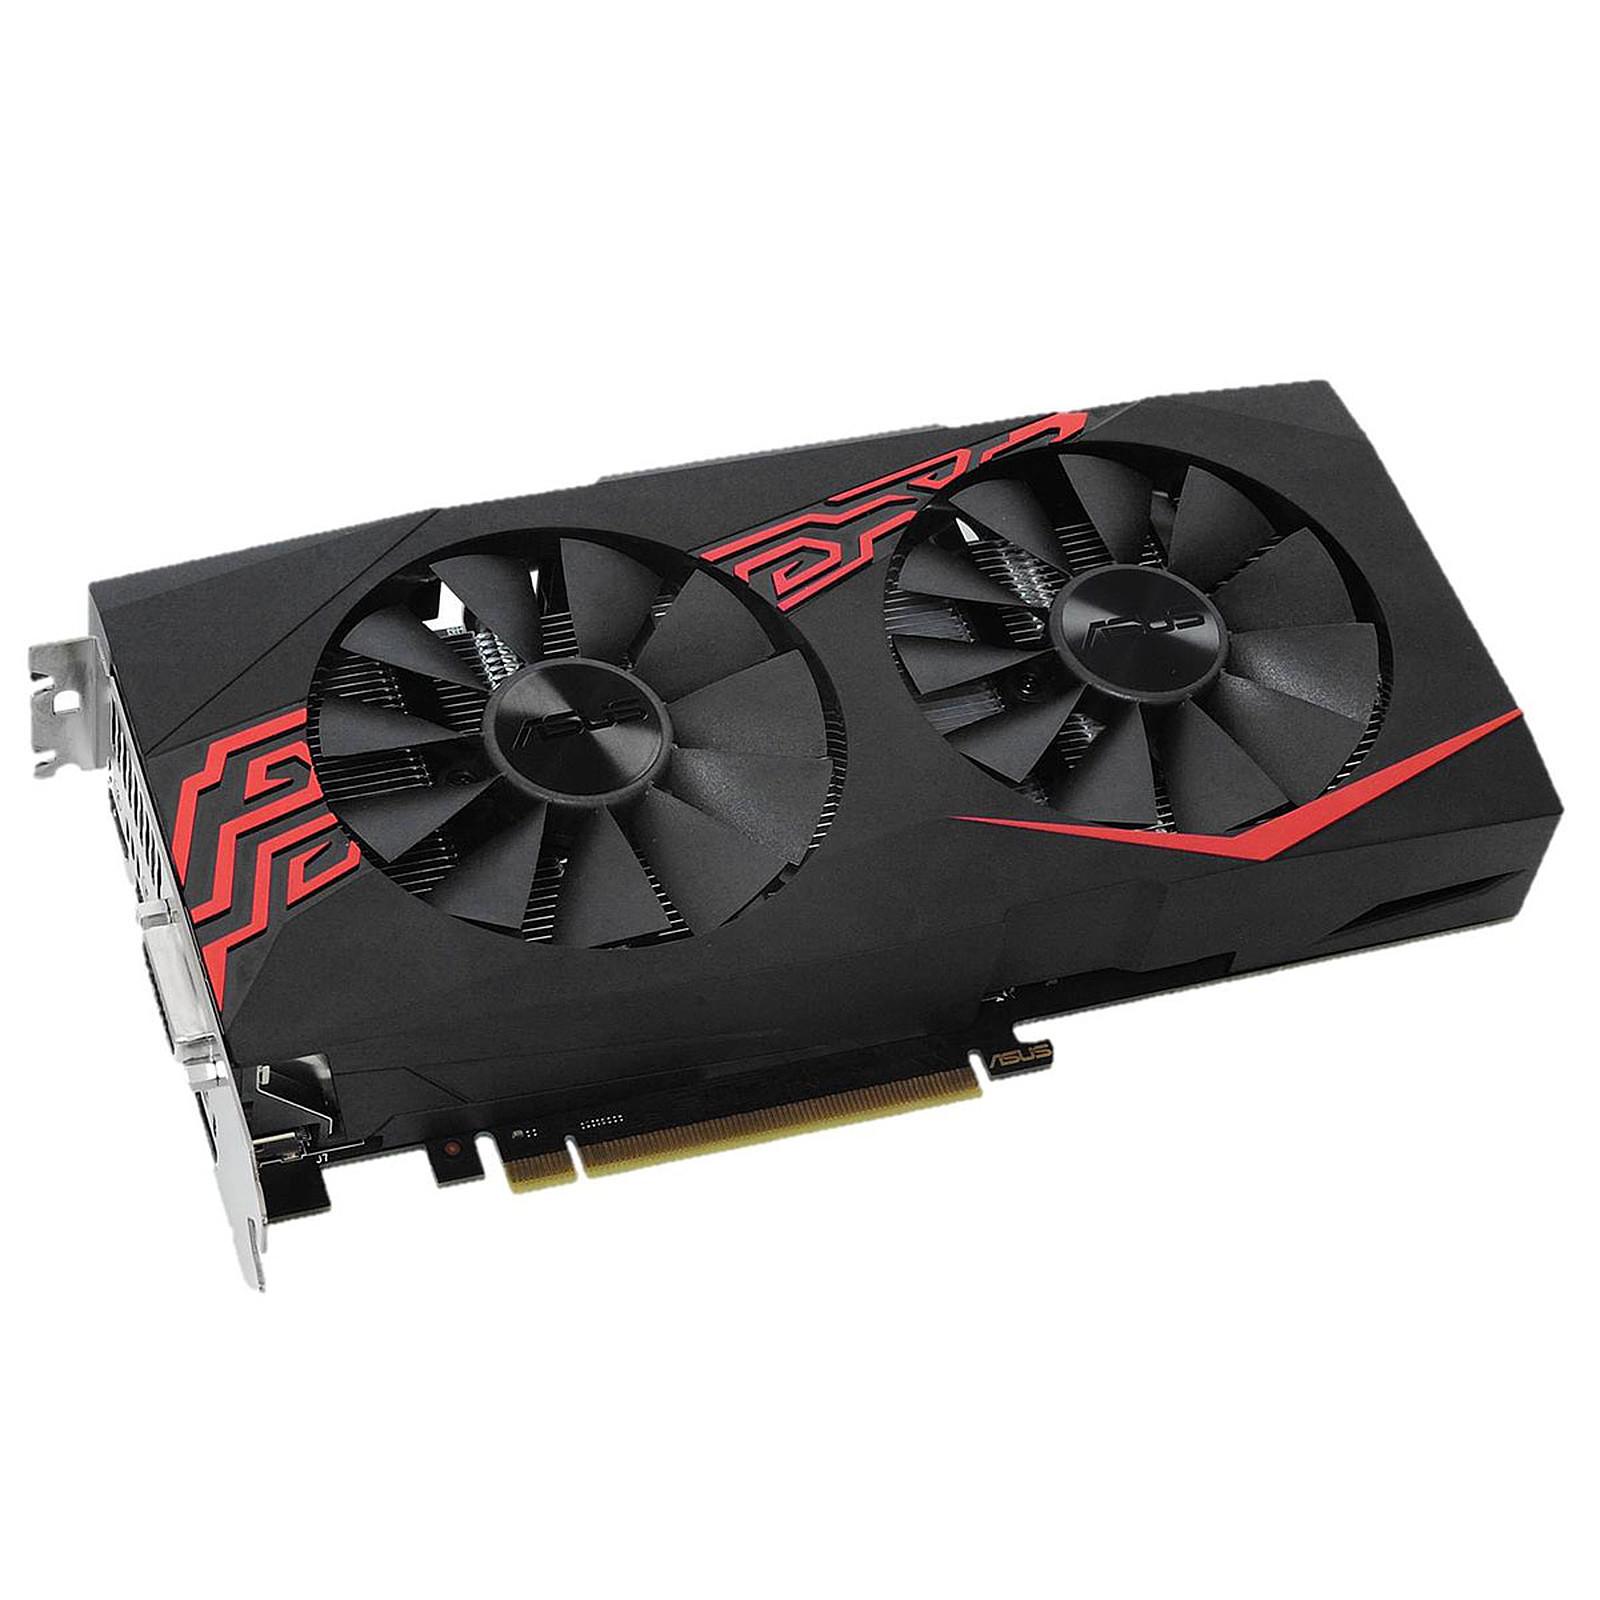 ASUS GeForce GTX 1070 Expedition OC Edition EX-GTX1070-O8G